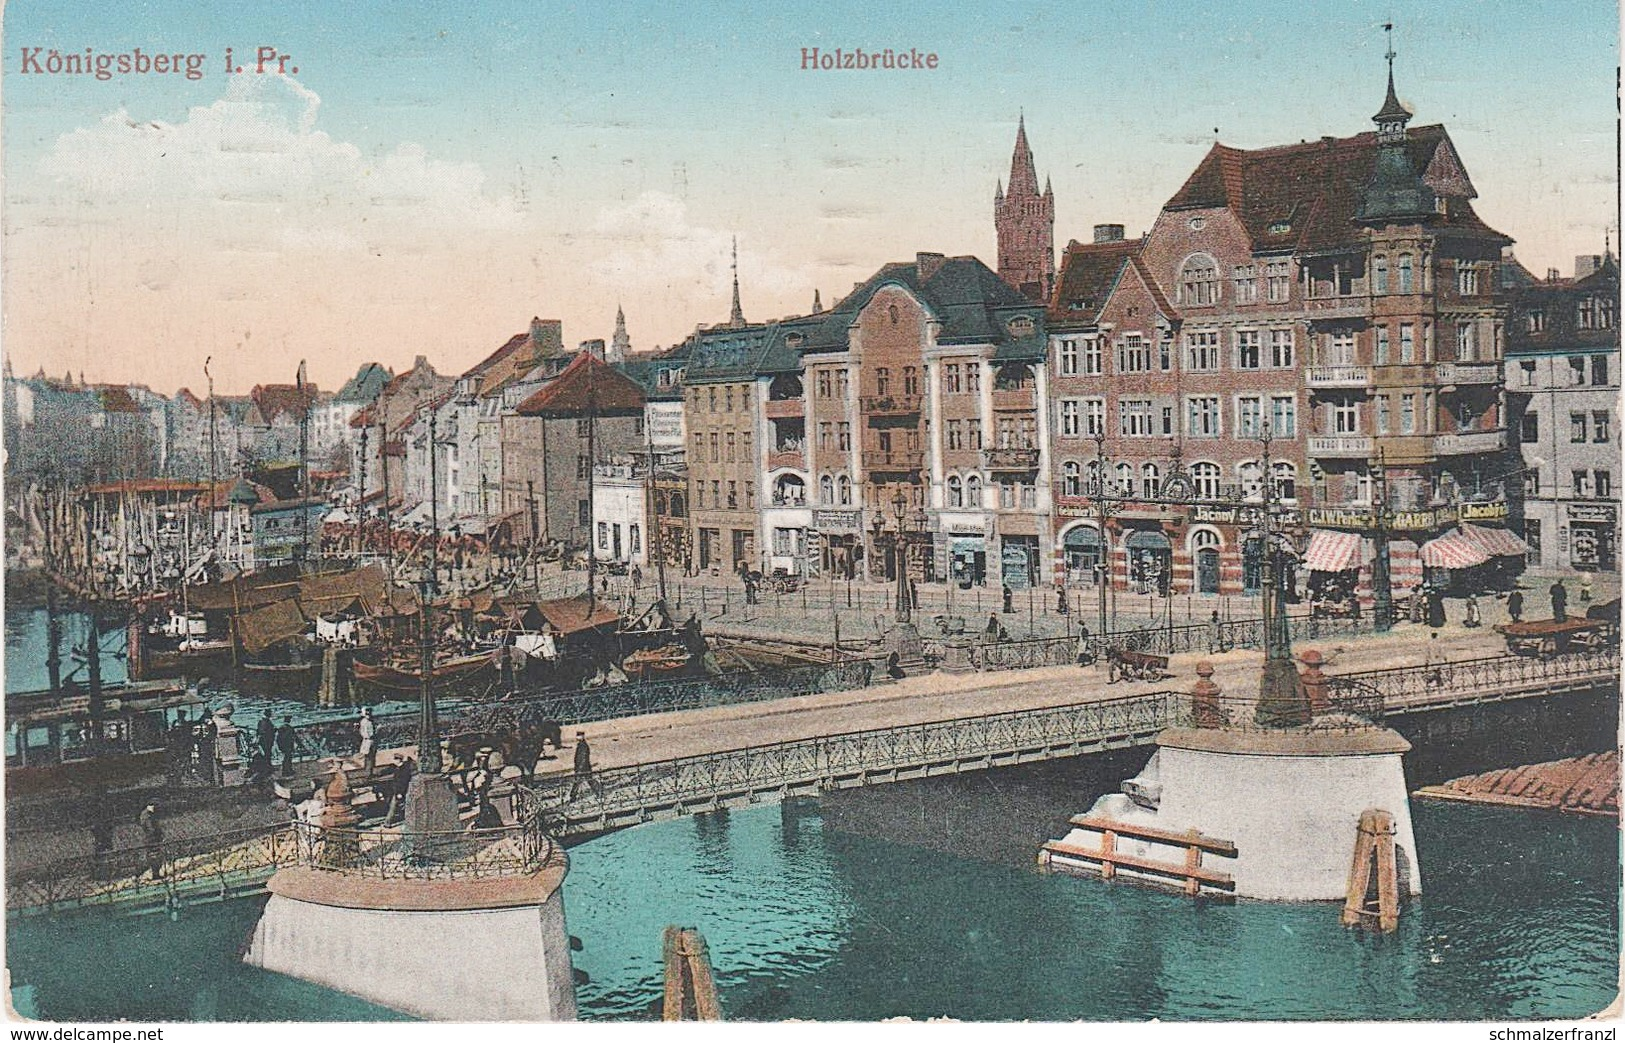 AK Königsberg Kaliningrad Калинингра́д Holzbrücke Pregel Hafen Kneiphof Insel Fischmarkt A Tilsit Sowetsk Memel Klaipeda - Ostpreussen